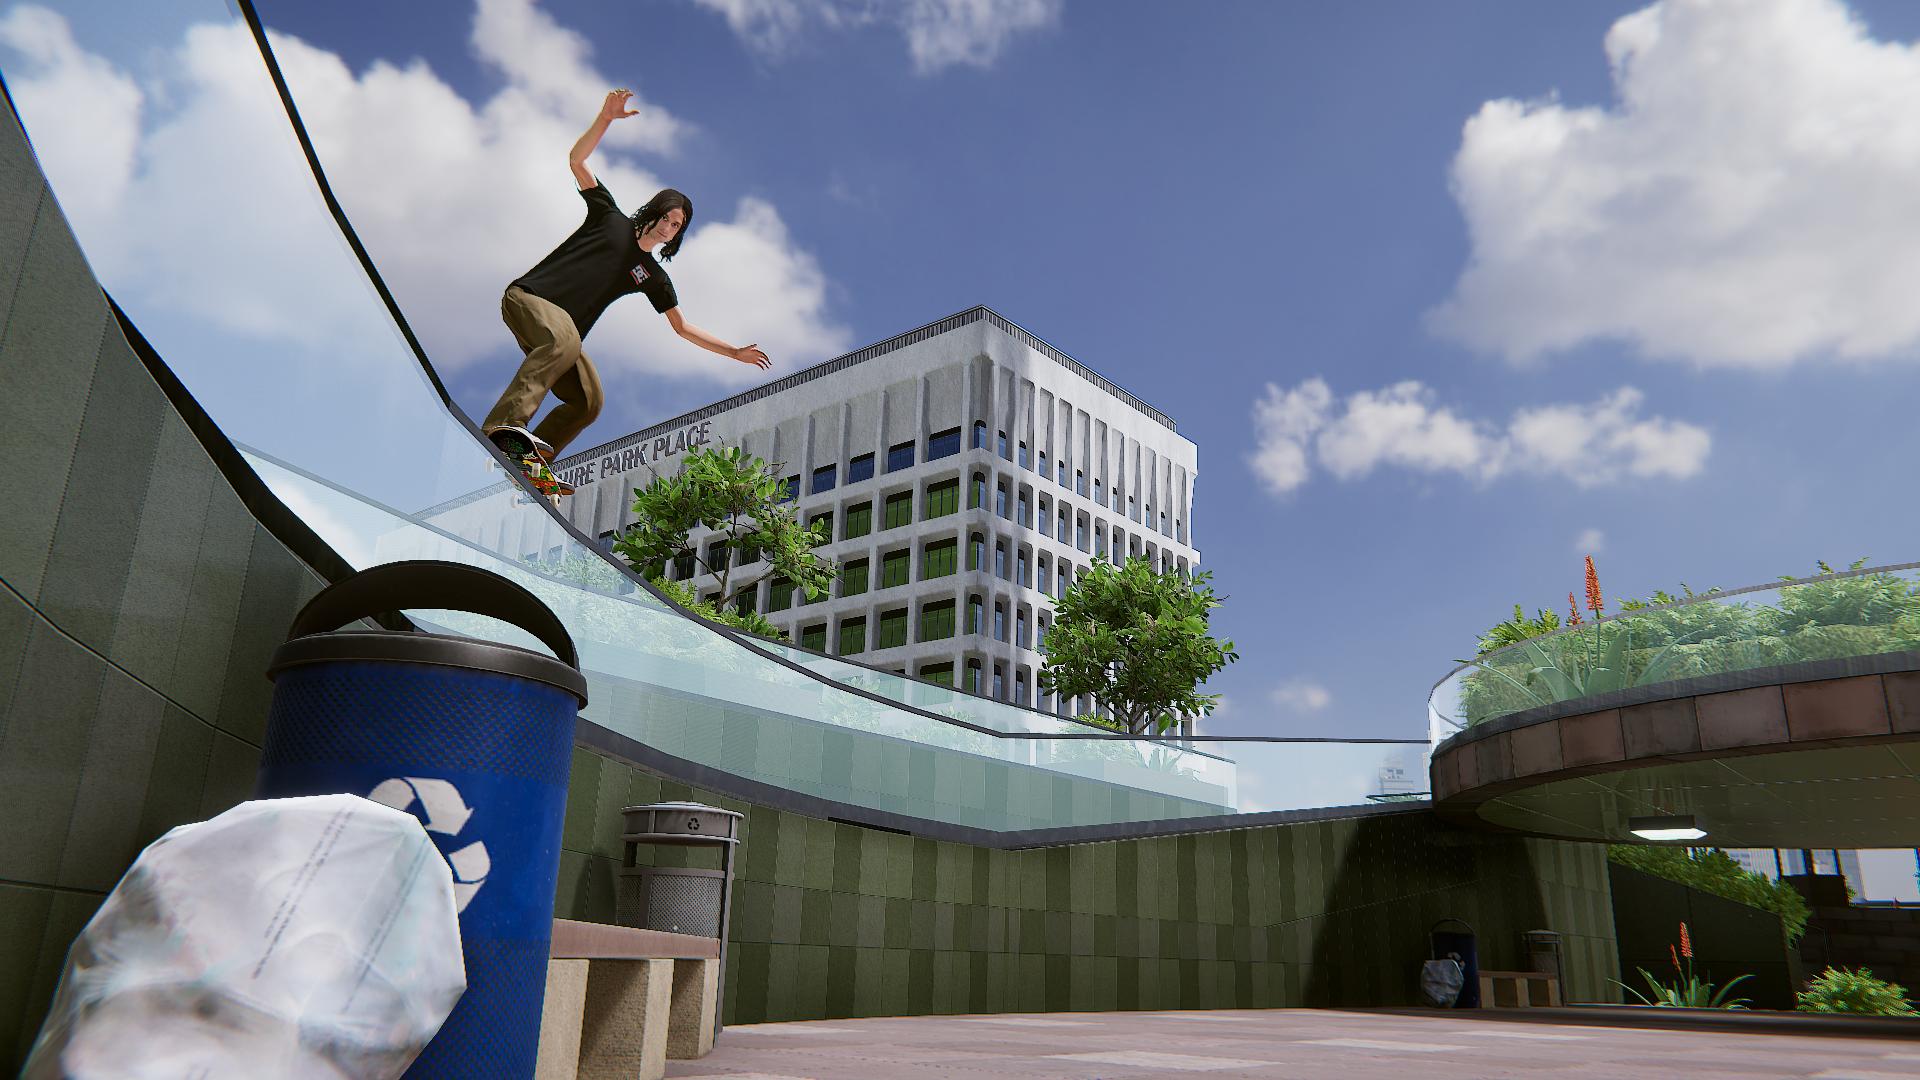 Skater XL Evan Smith